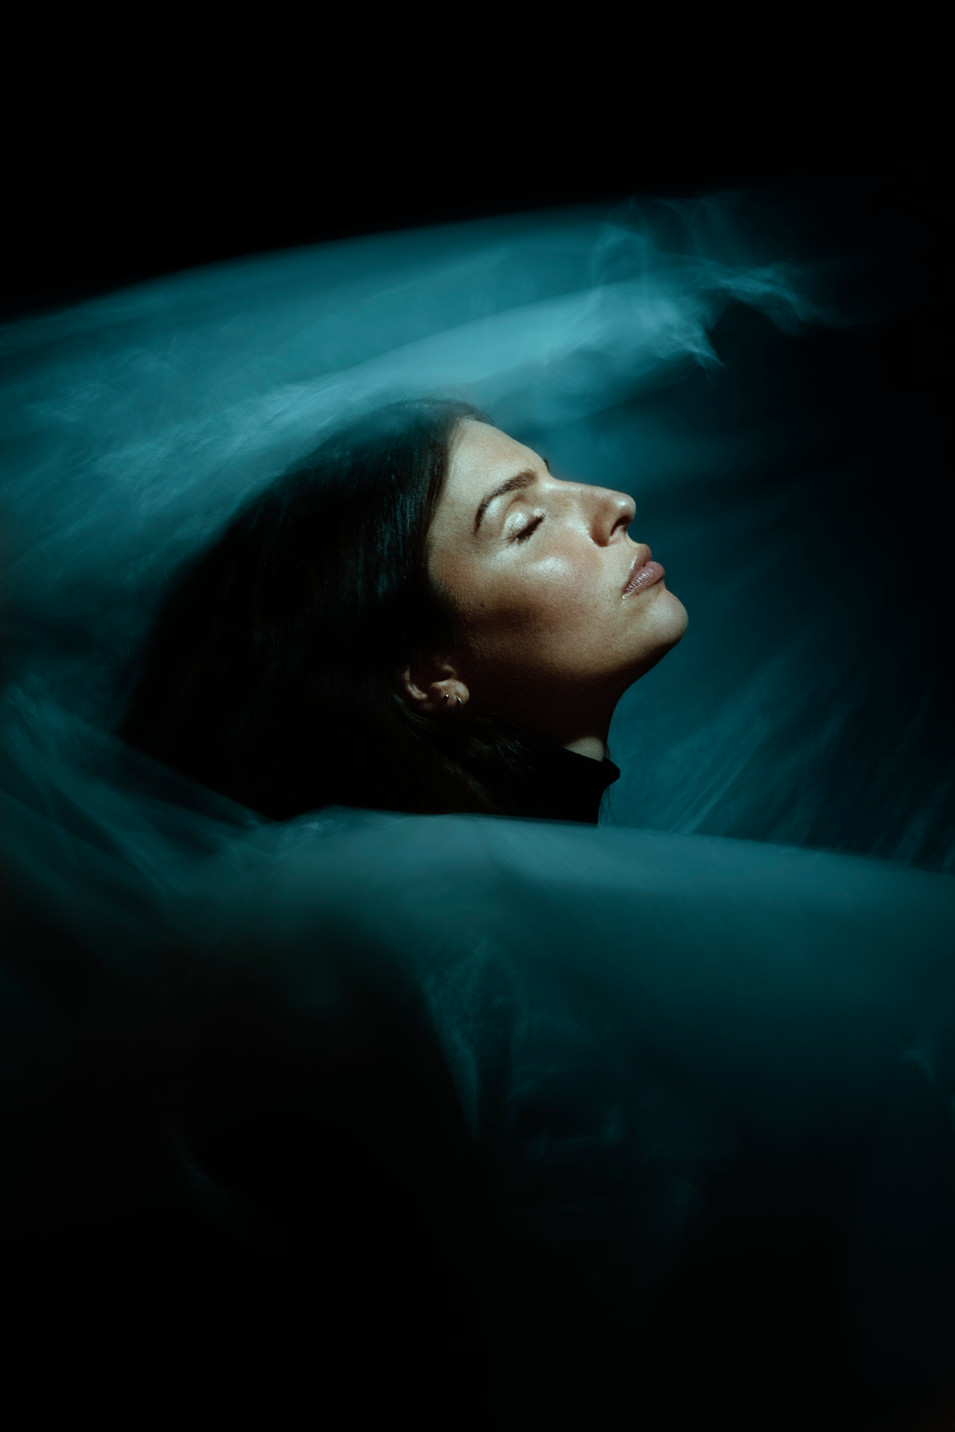 © Maéva Mitram - PORTRAIT